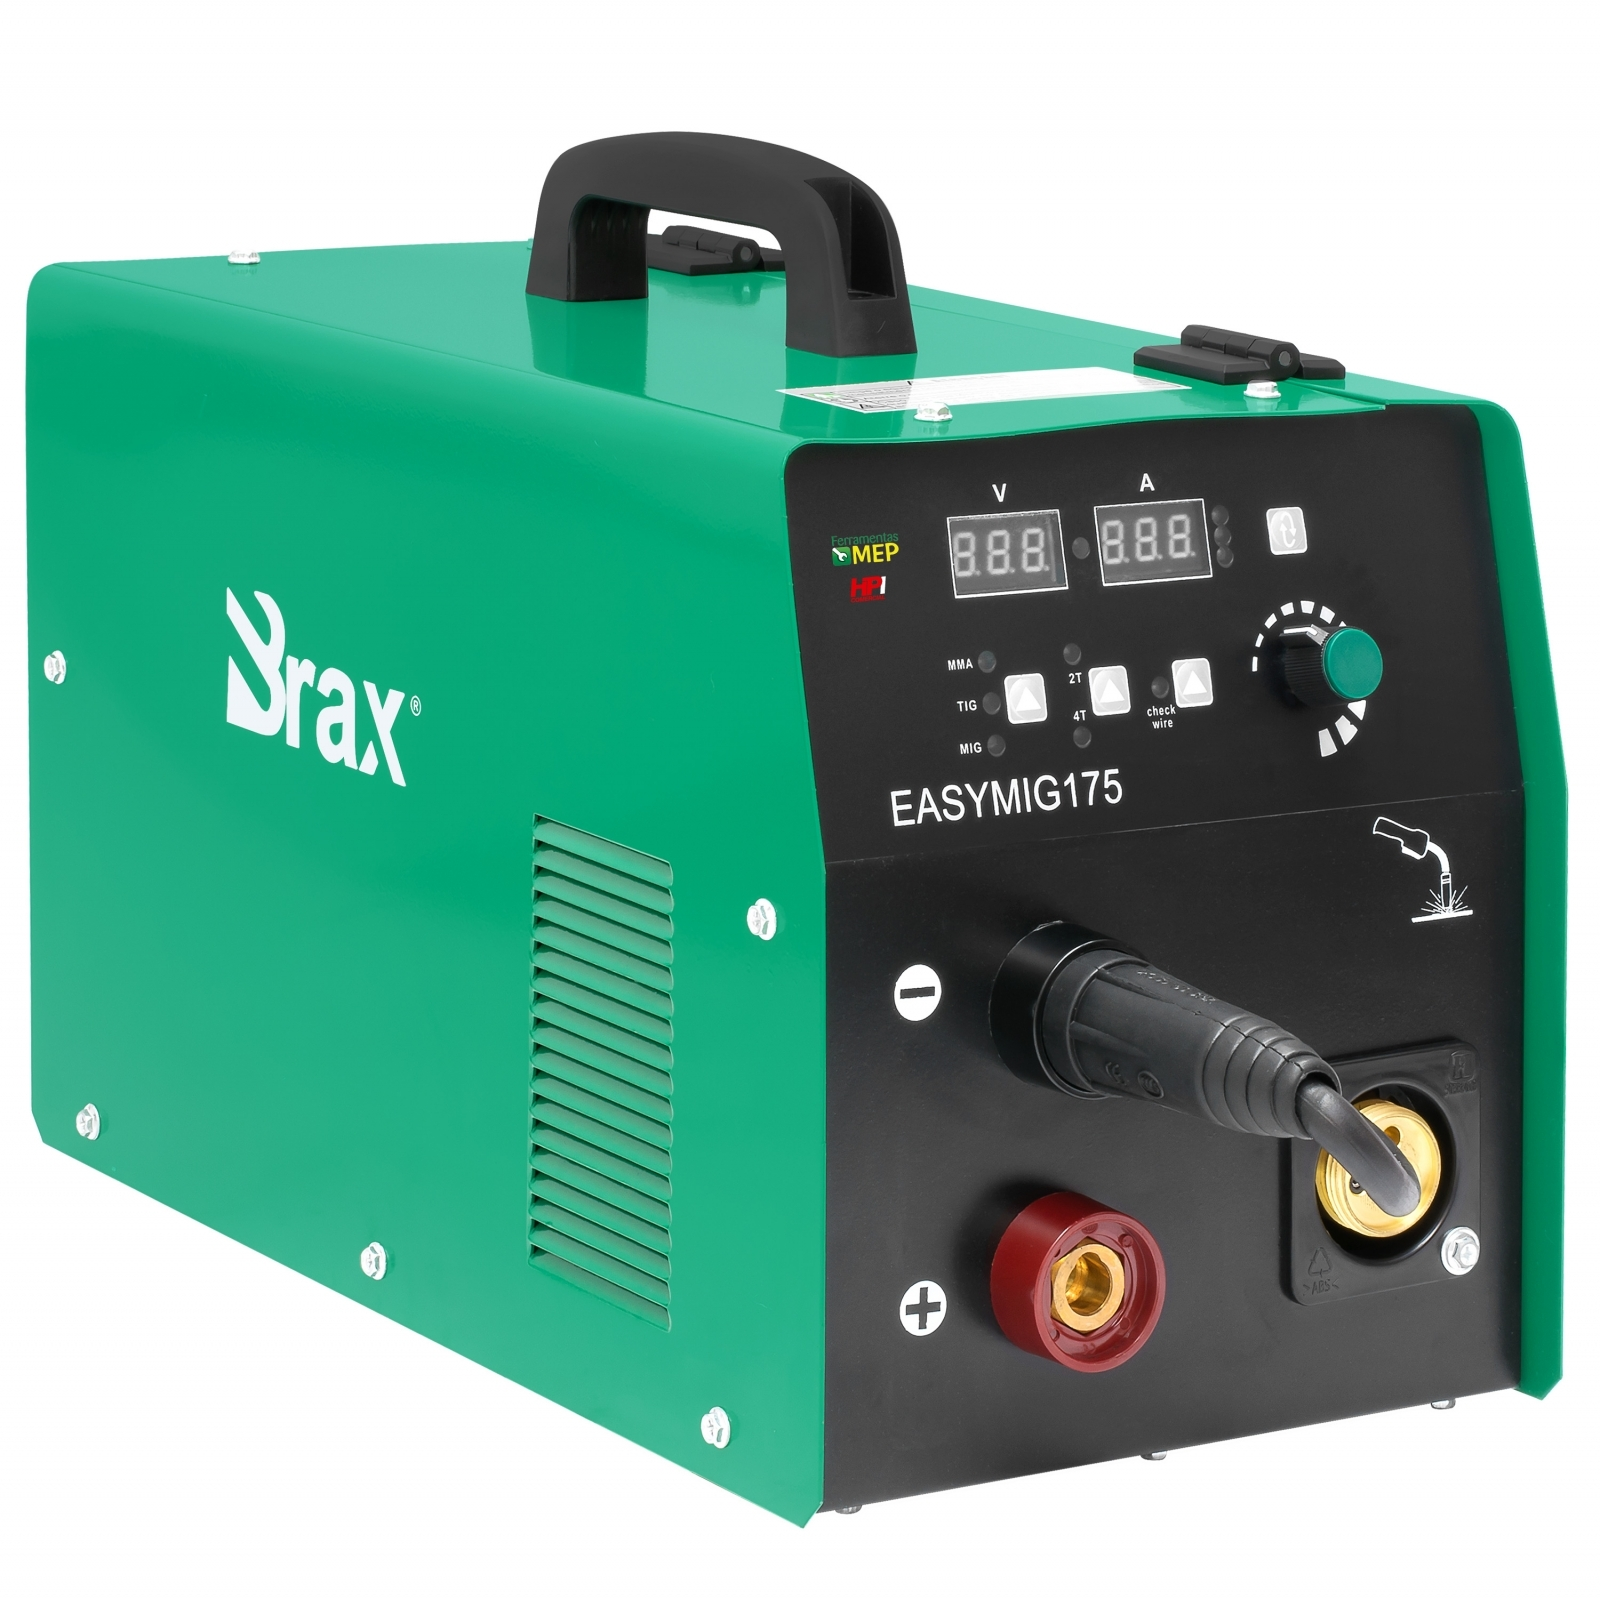 Máquina De Solda Mig Brax 175amp Multiprocesso 220v Mb7 - Ferramentas MEP